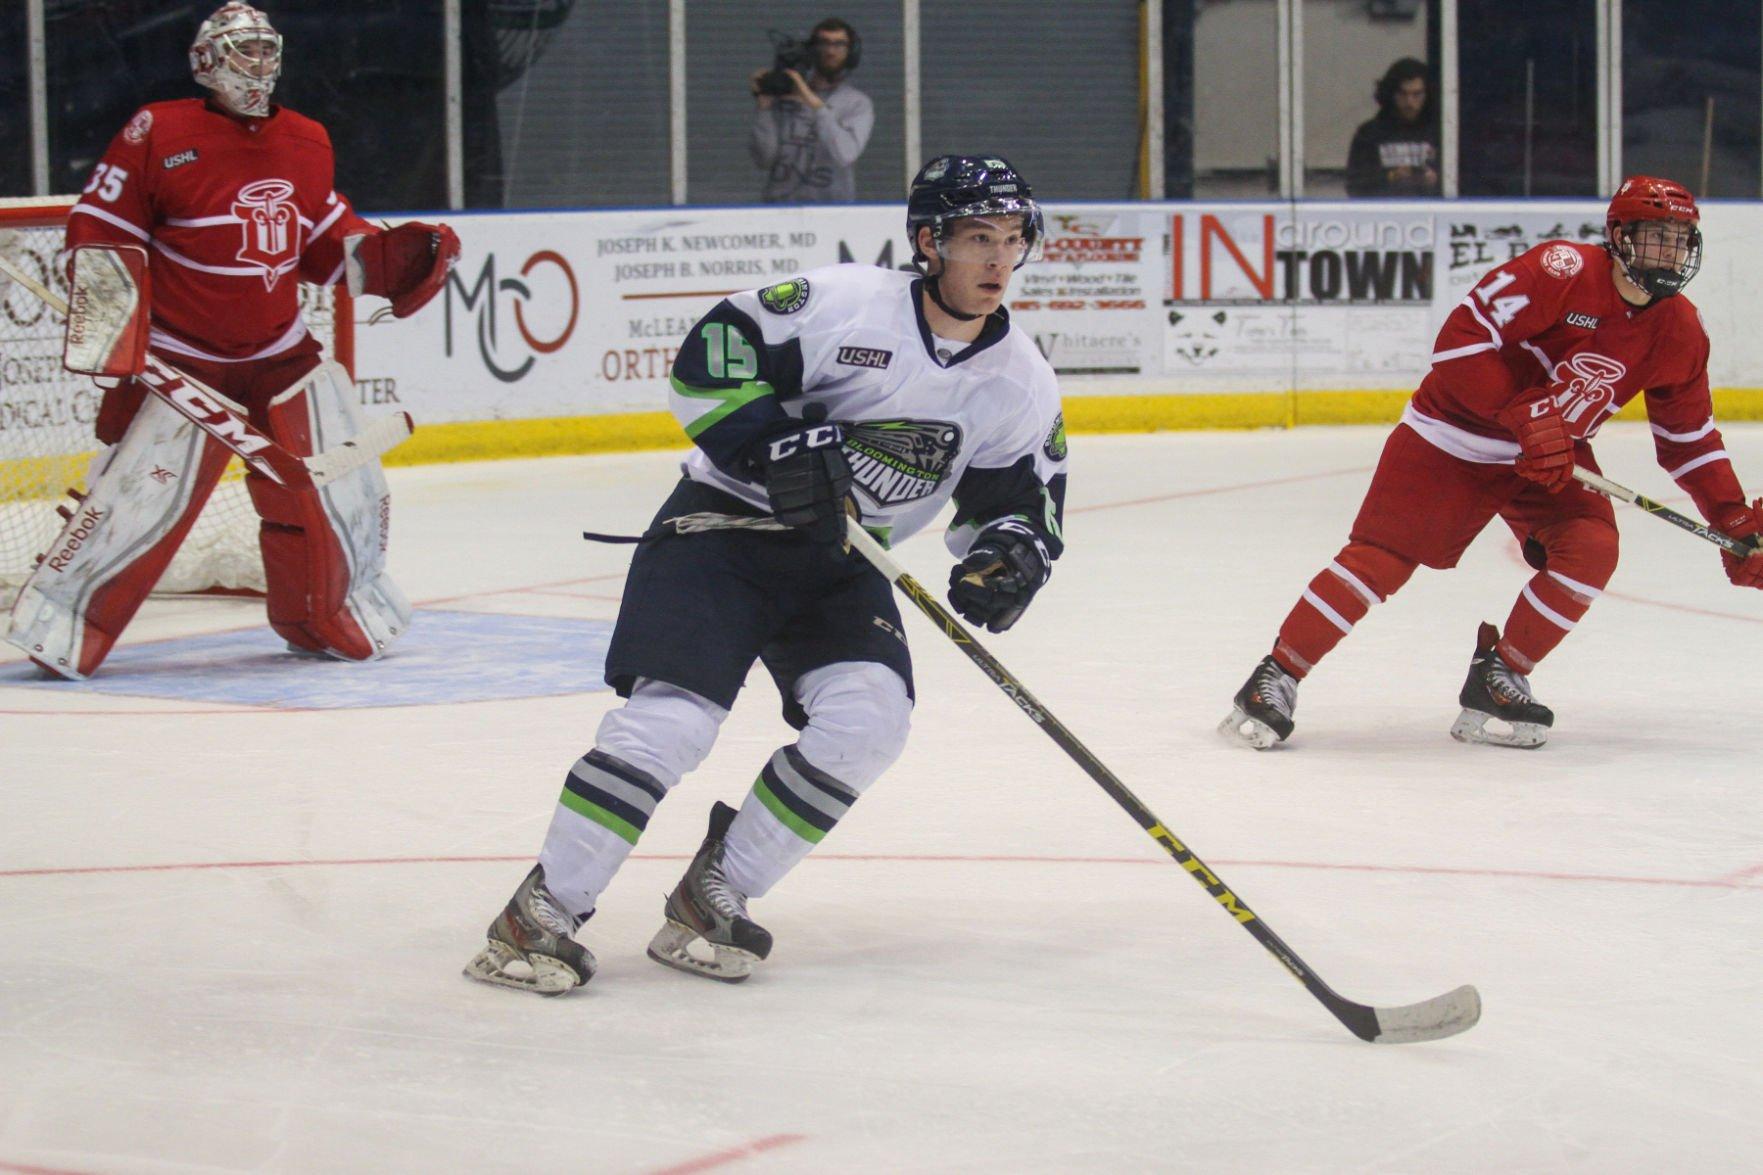 USHL: Thunder Notes - Dzhioshvili Tabbed For Top Prospects Game